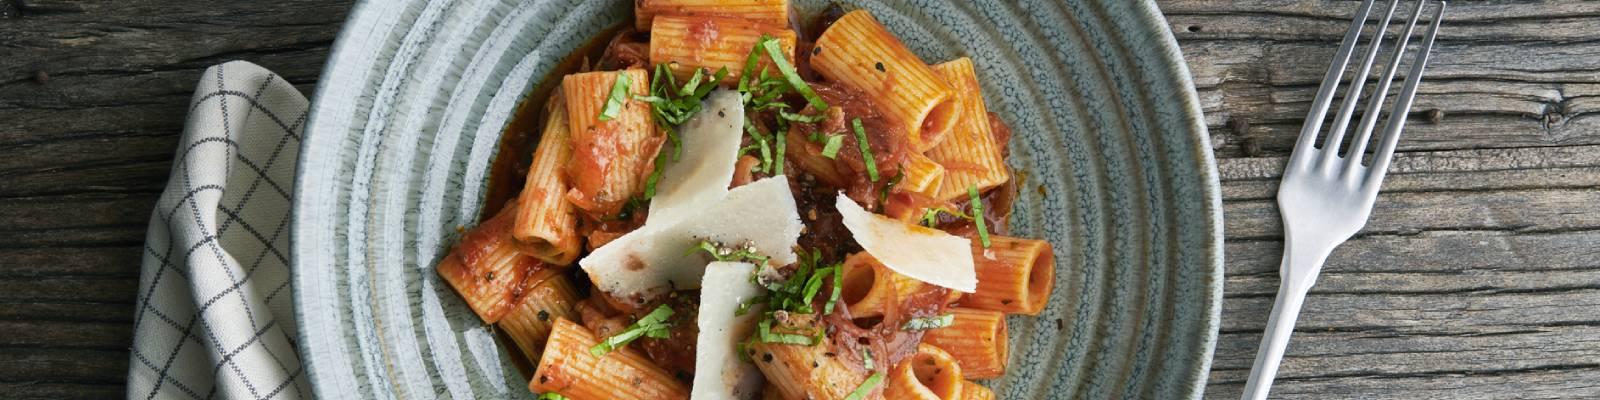 Pasta Garofalo - Rigatoni alla Norma